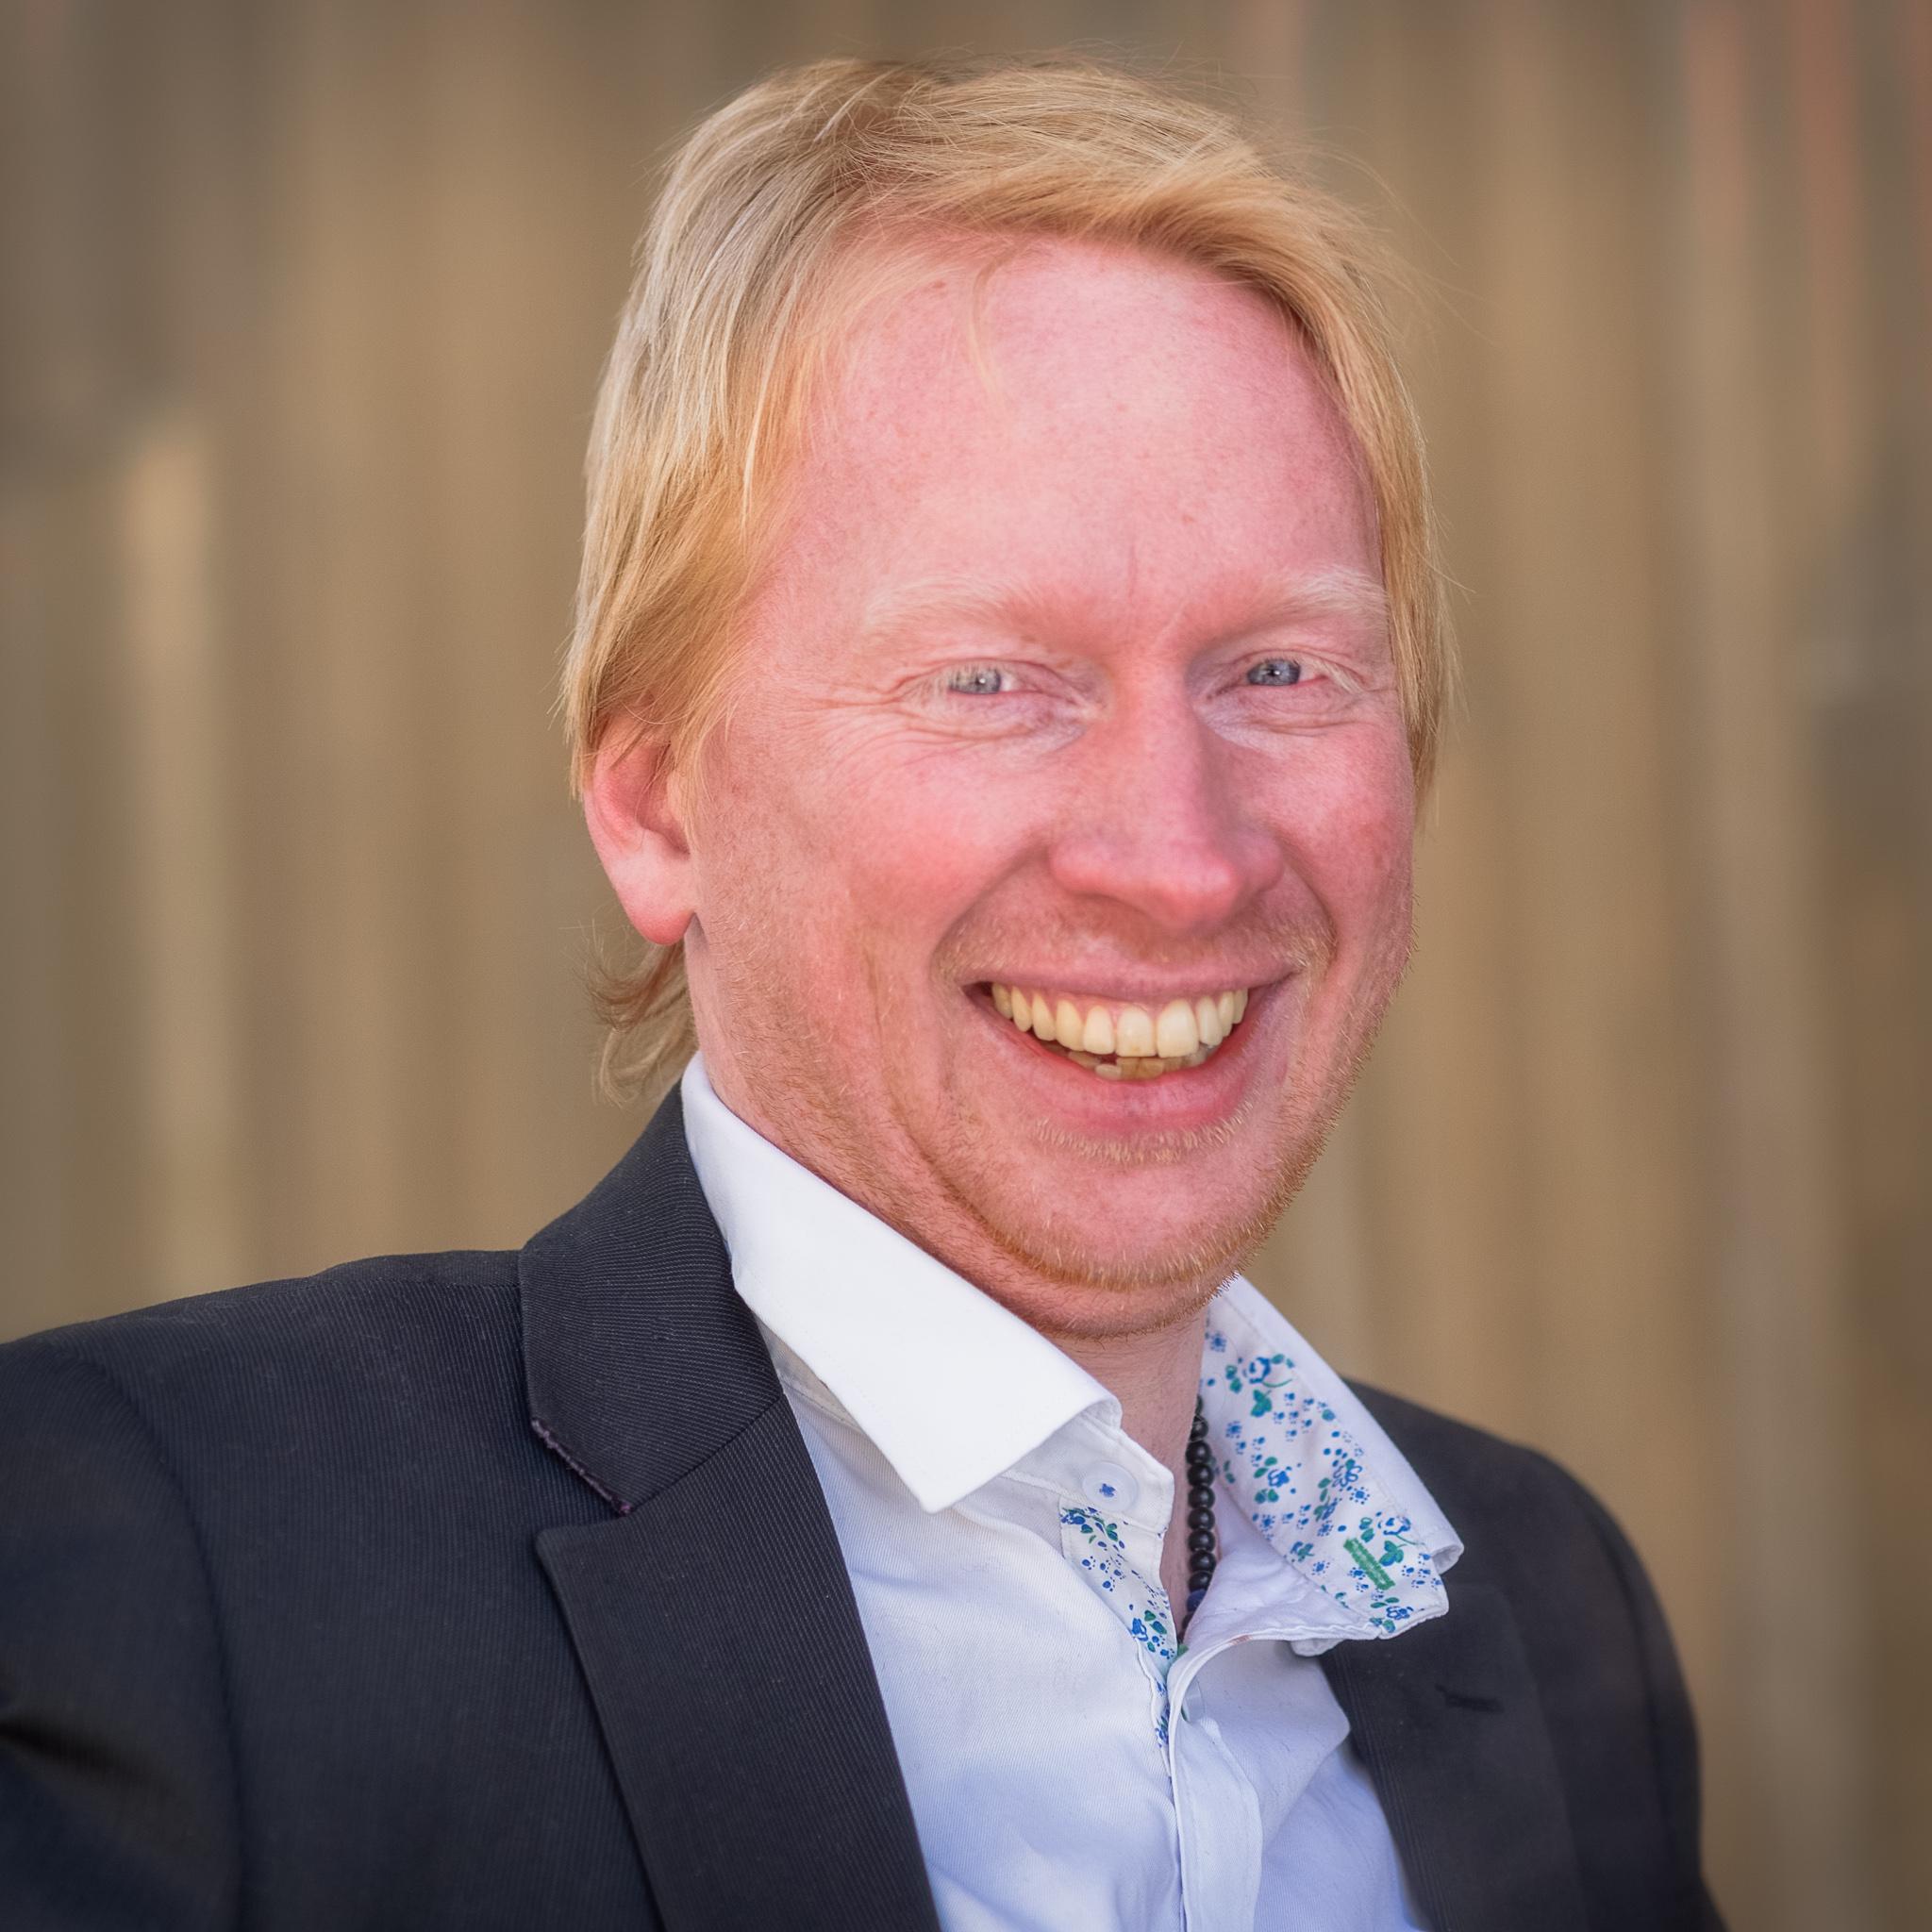 Petter Erik Nyvoll